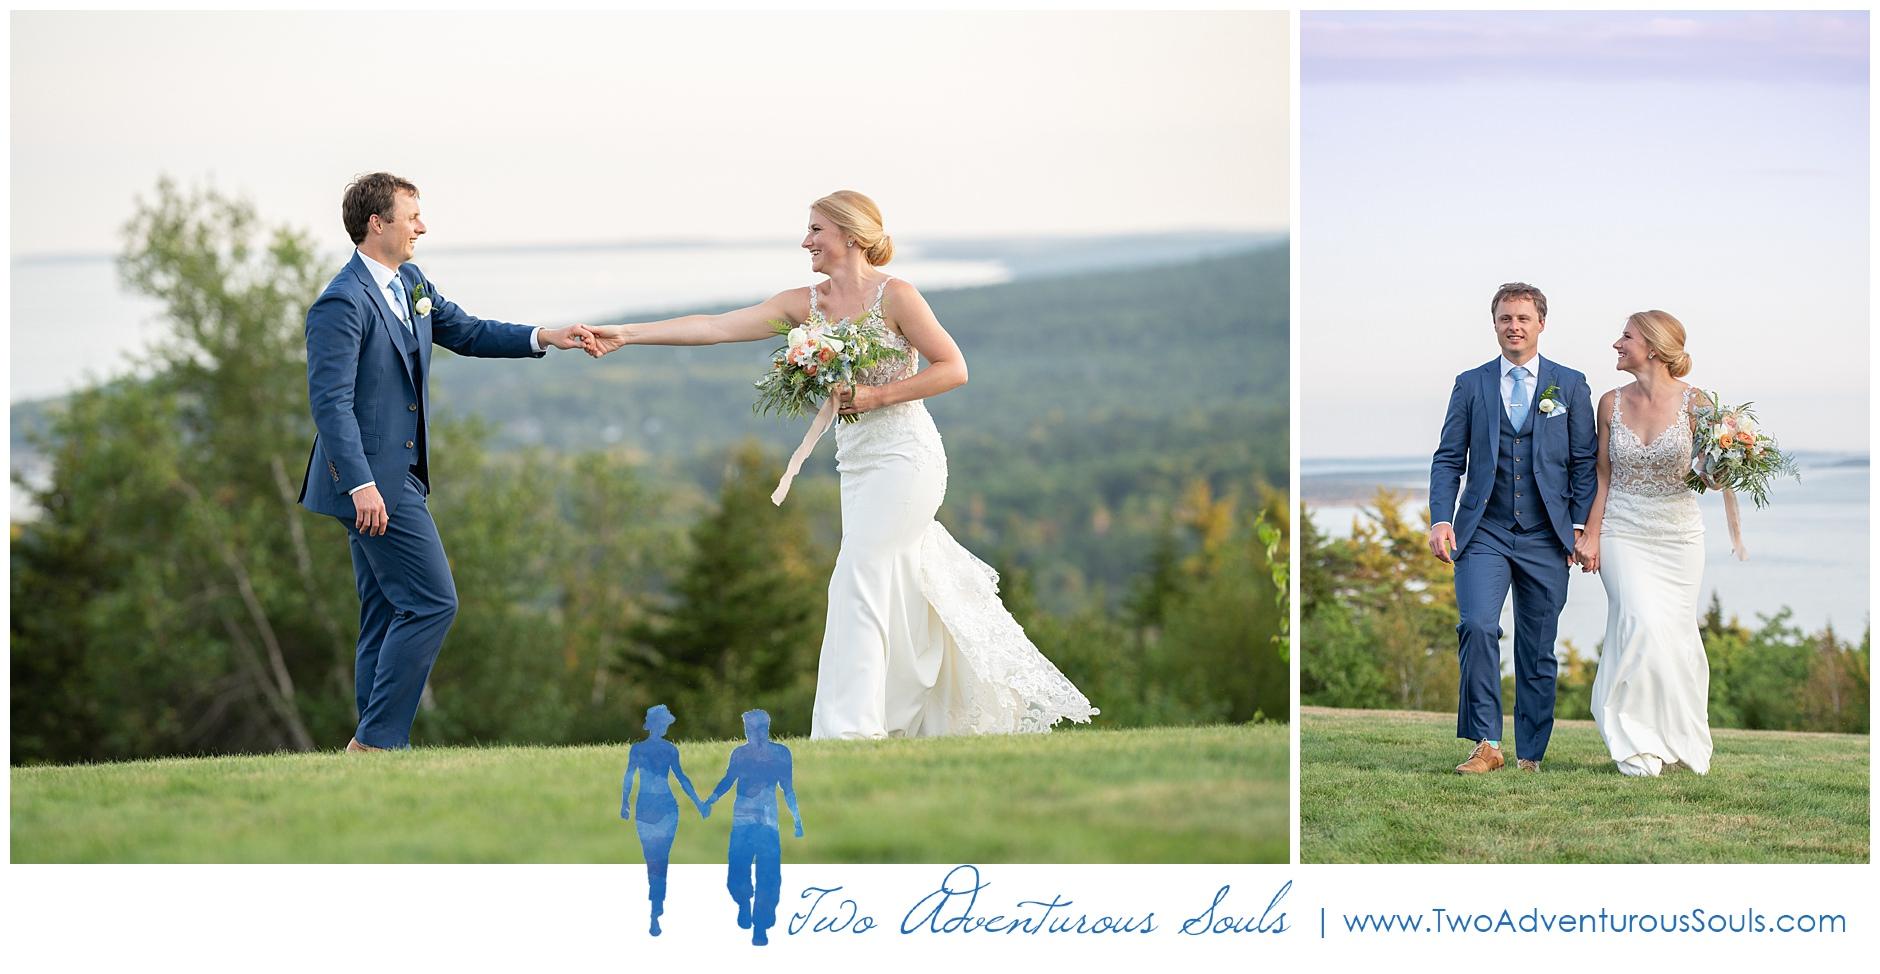 Maine Wedding Photographers, Point Lookout Wedding Photographers, Maine Elopement Photographers, Two Adventurous Souls-0080419_0057.jpg